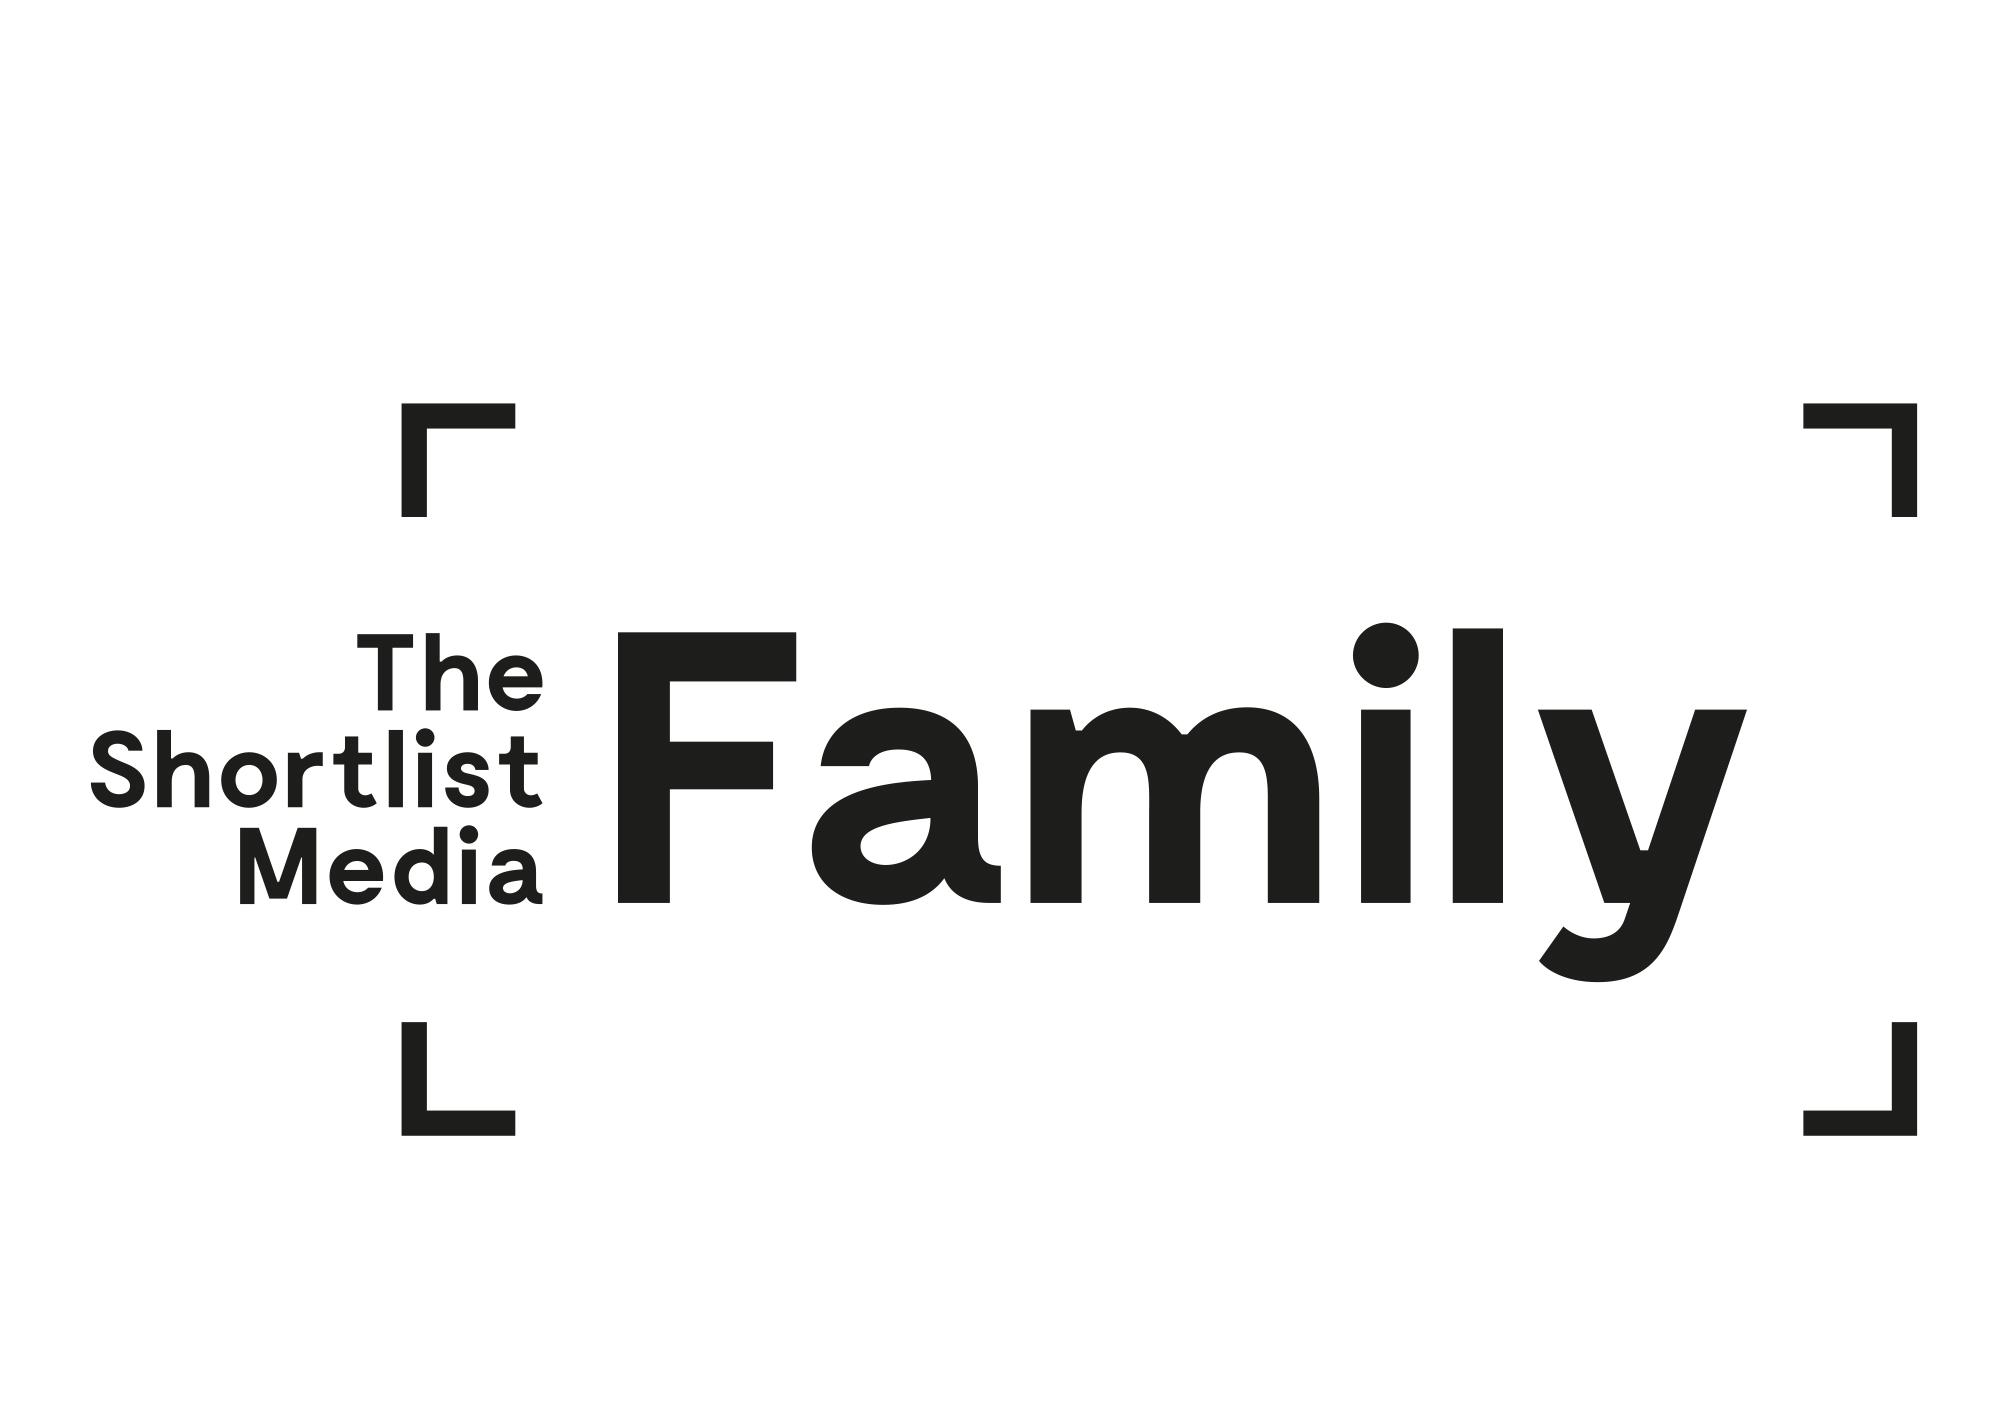 Shortlist Media Family branding | Robin Farley